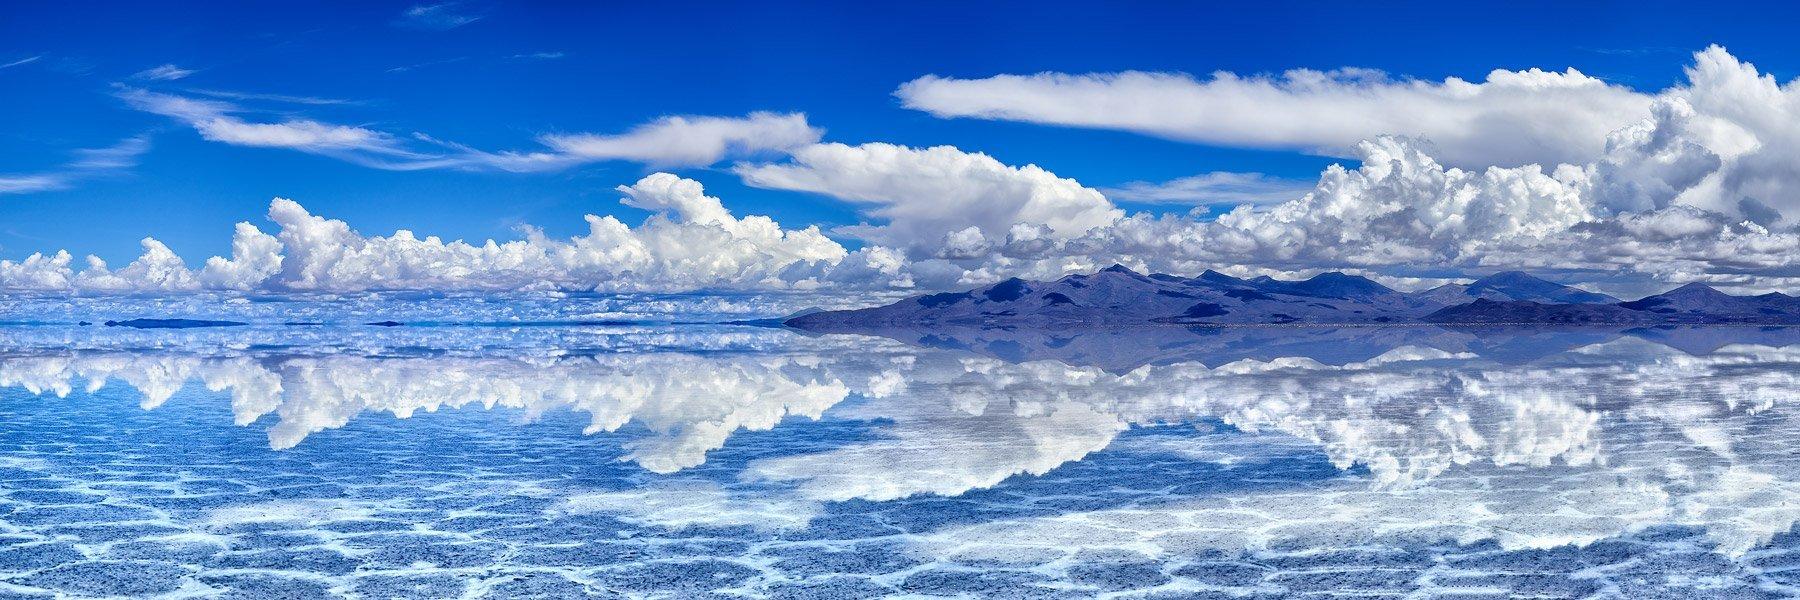 Fluffy white clouds perfectly reflected in Salar de Uyuni salt lake, Bolivia.